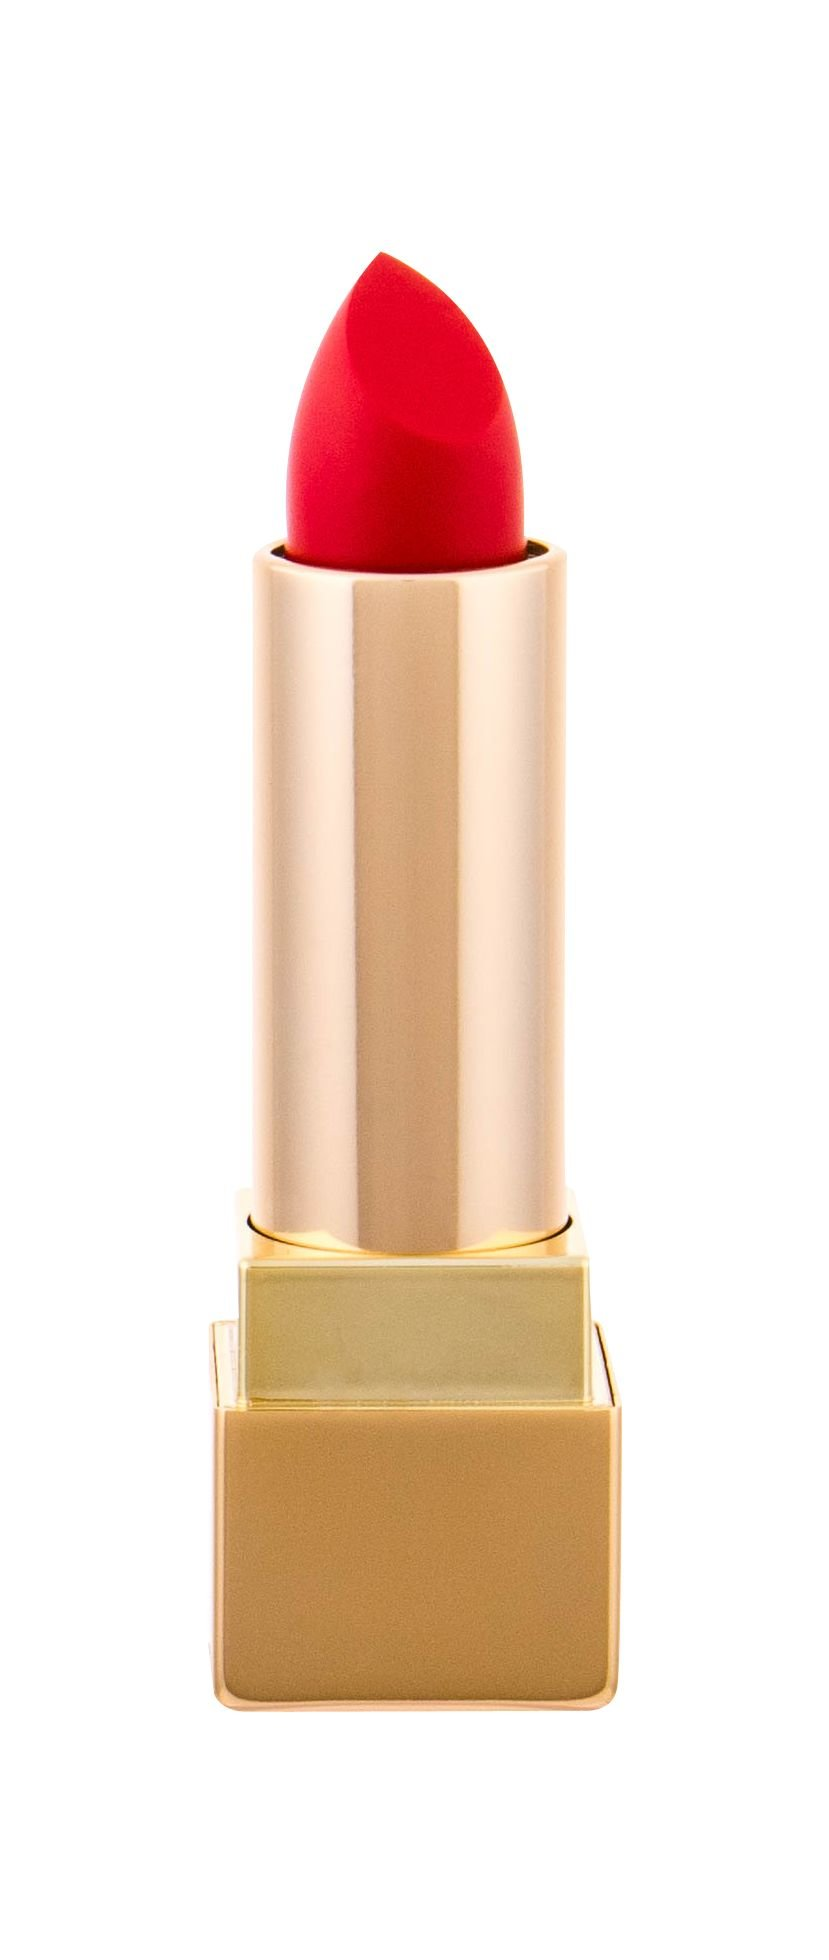 Yves Saint Laurent Rouge Pur Couture Lipstick 3,8ml 201 Orange Imagine